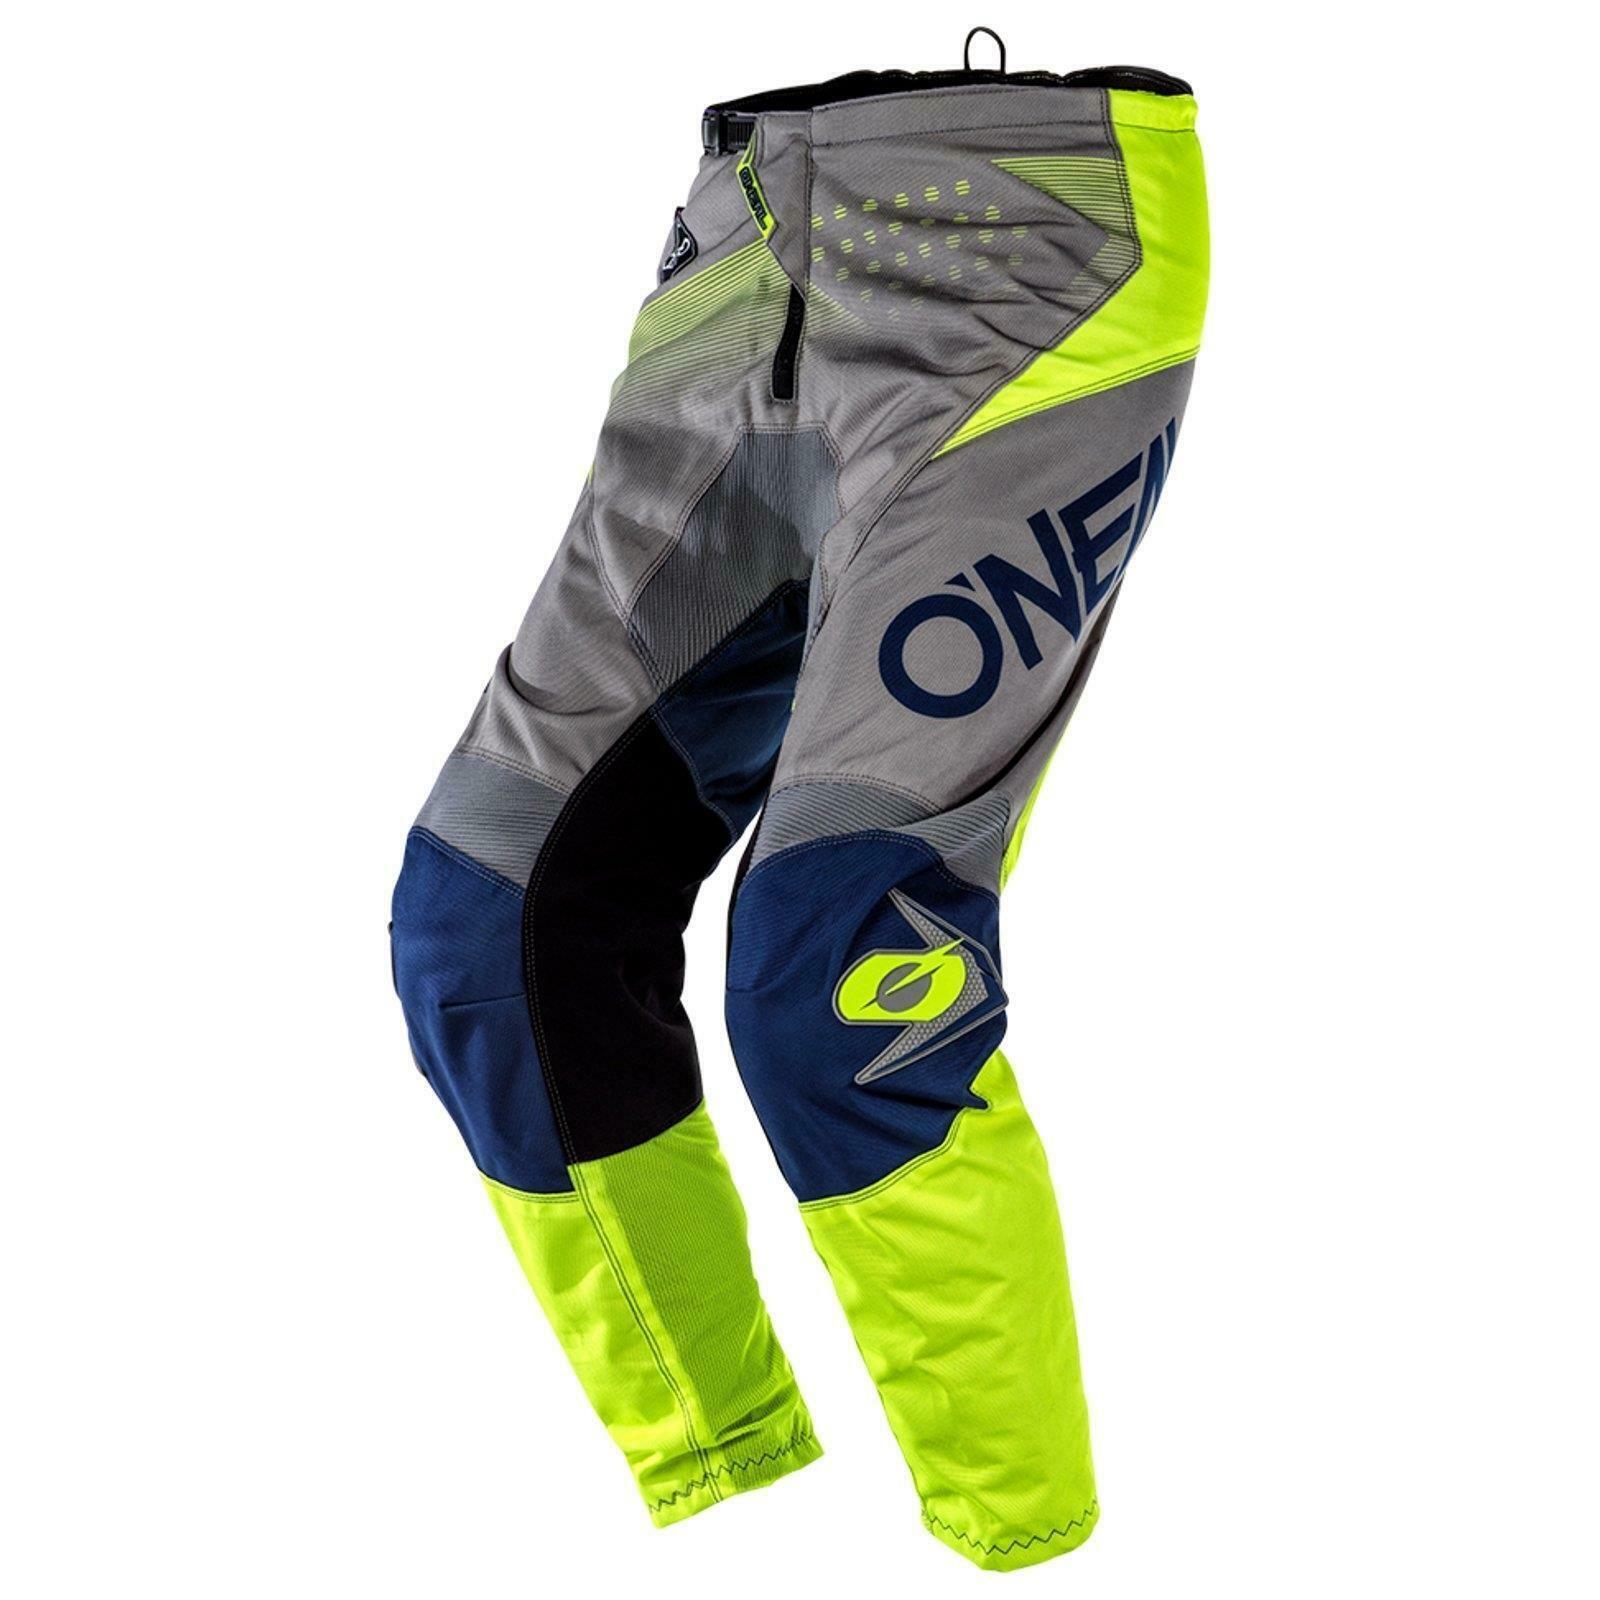 ONeal Mayhem Lite Blocker MX Moto Cross Hose Pant Enduro Mountainbike MTB AM